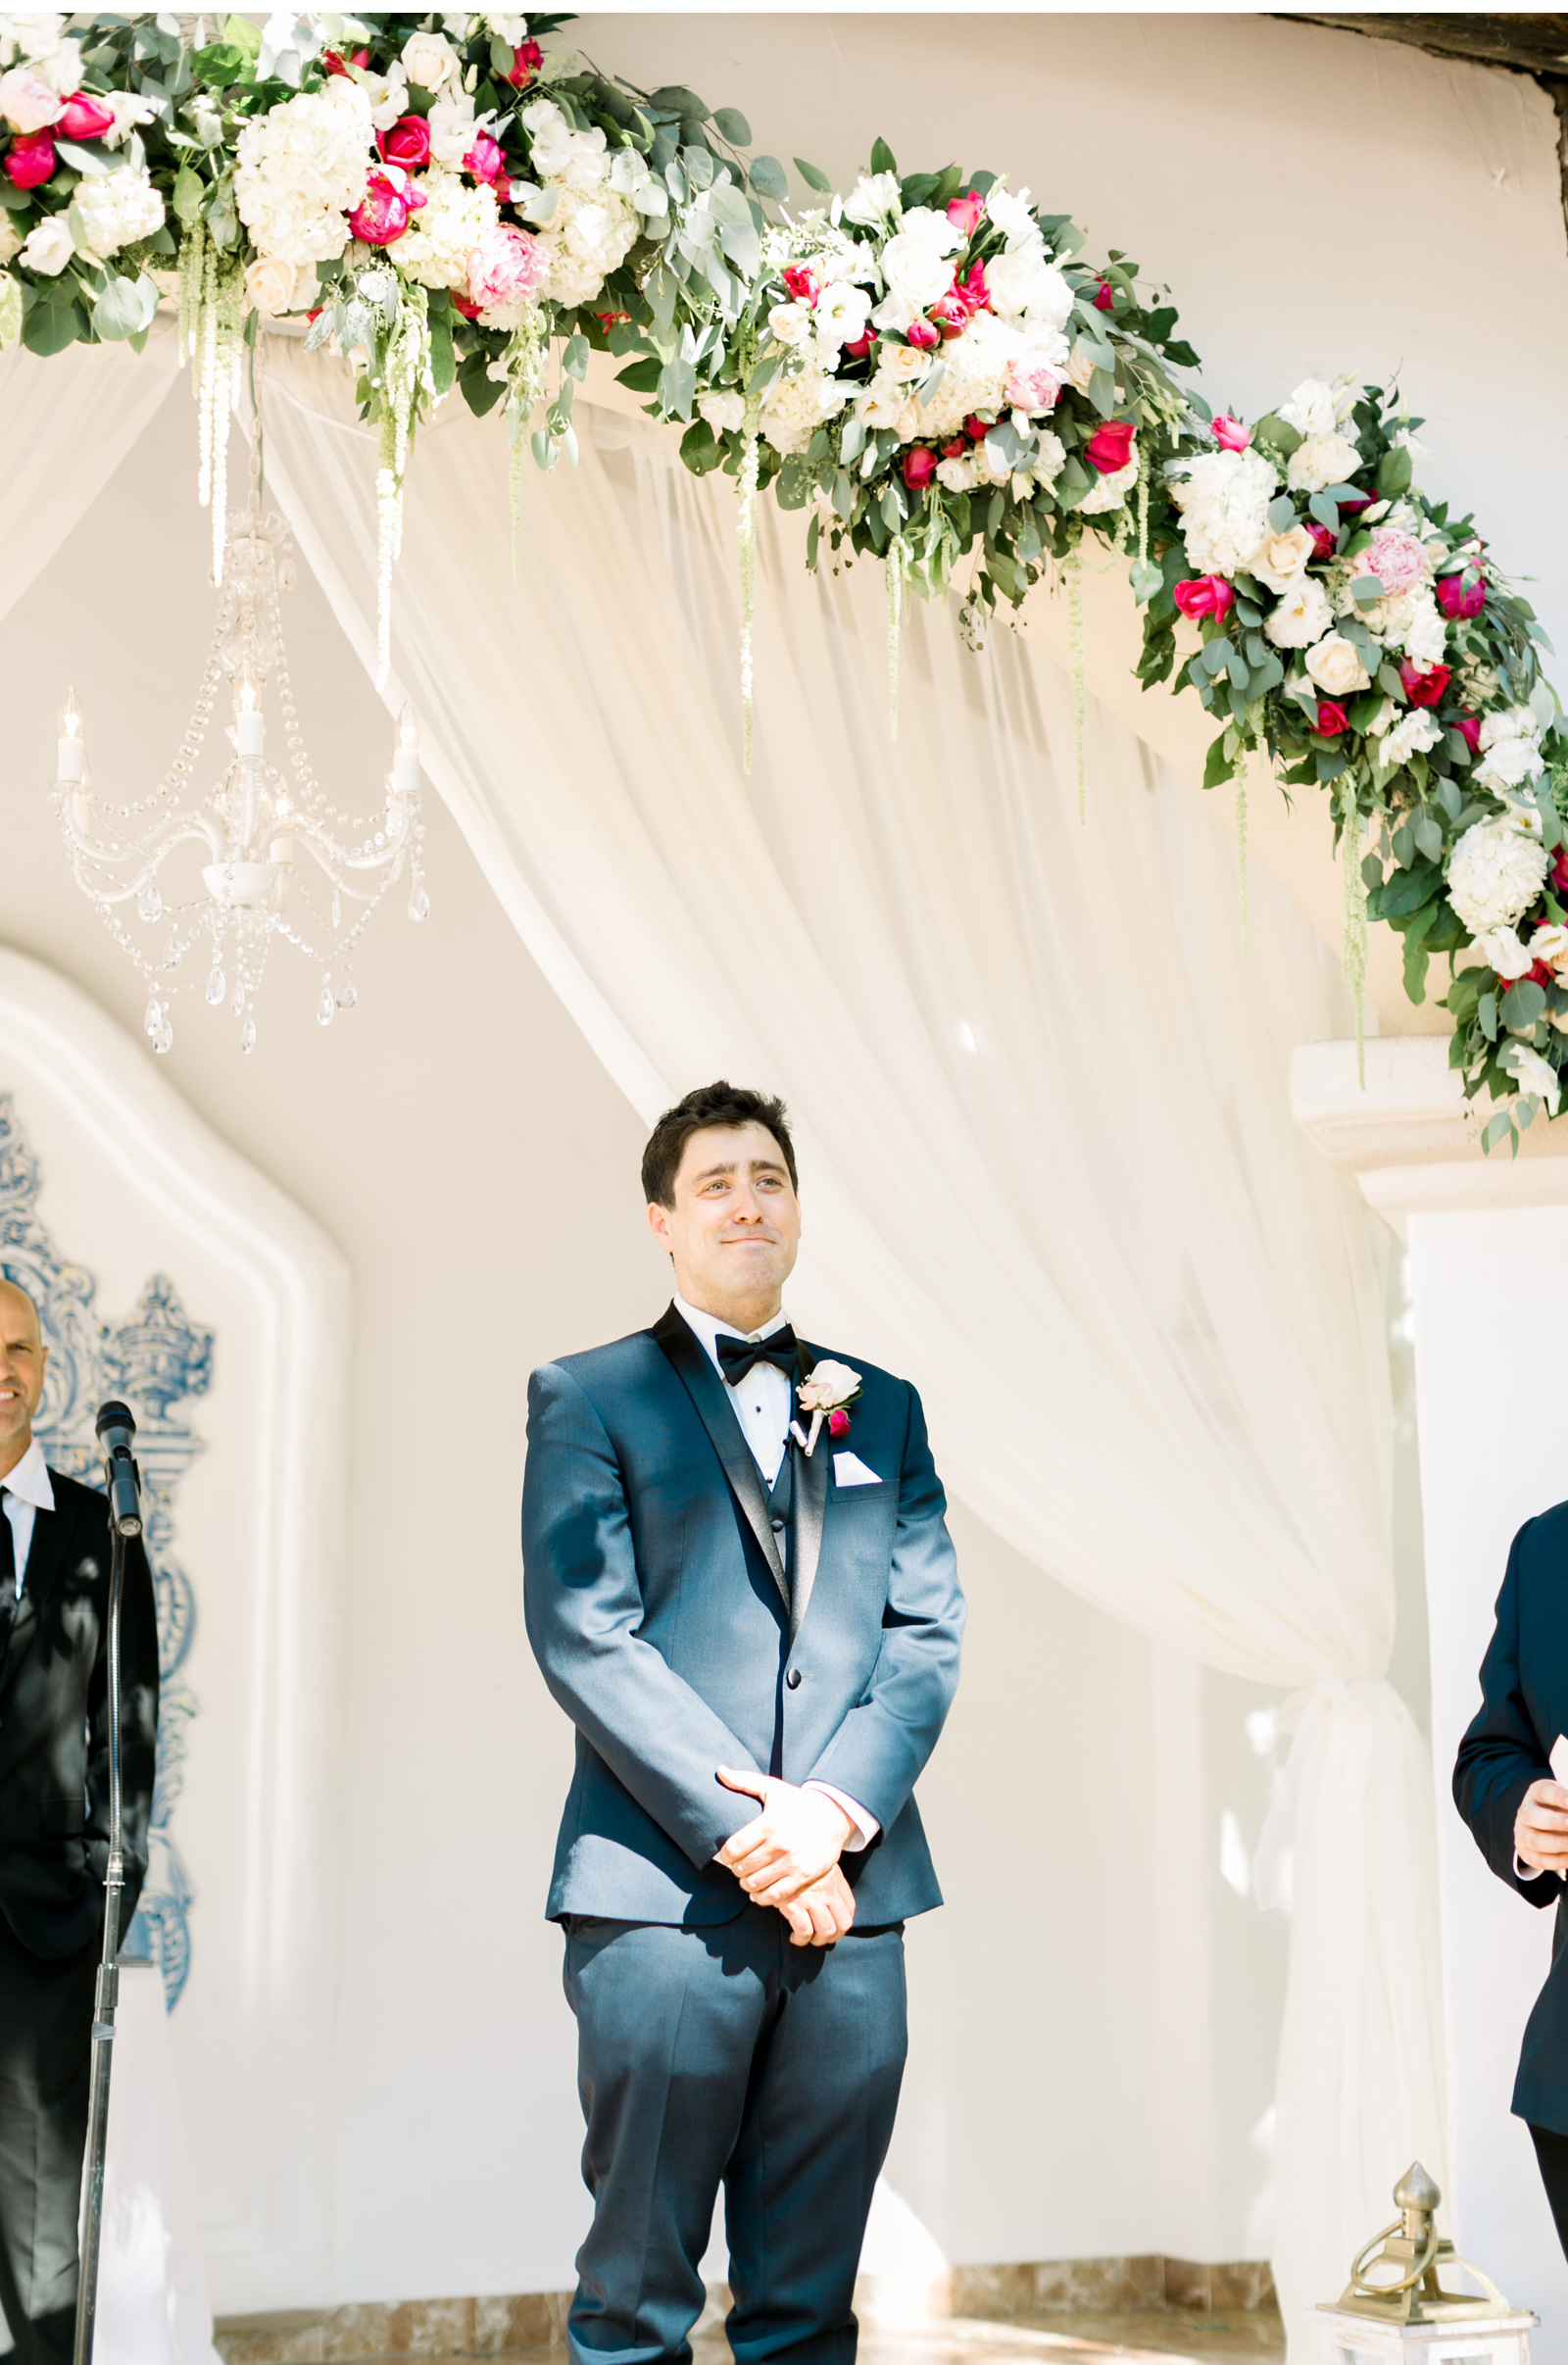 Malibu-Wedding-Triunfo-Creek-Natalie-Schutt-Photography_09.jpg